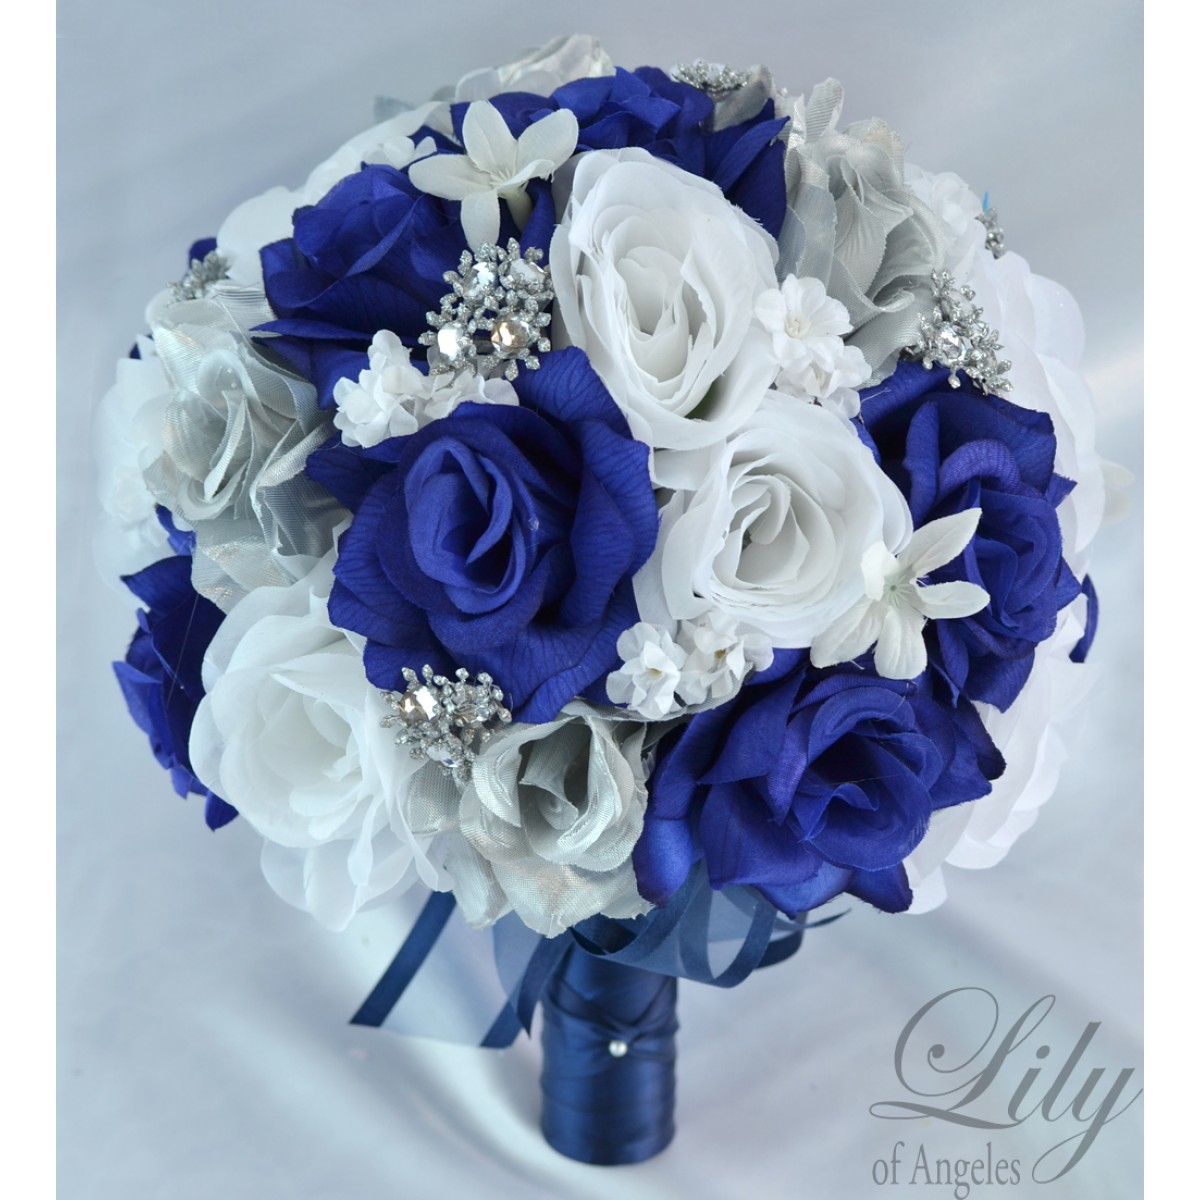 17 piece Wedding Flowers Bridal silk Bouquet LIGHT BLUE WHITE SILVER Package